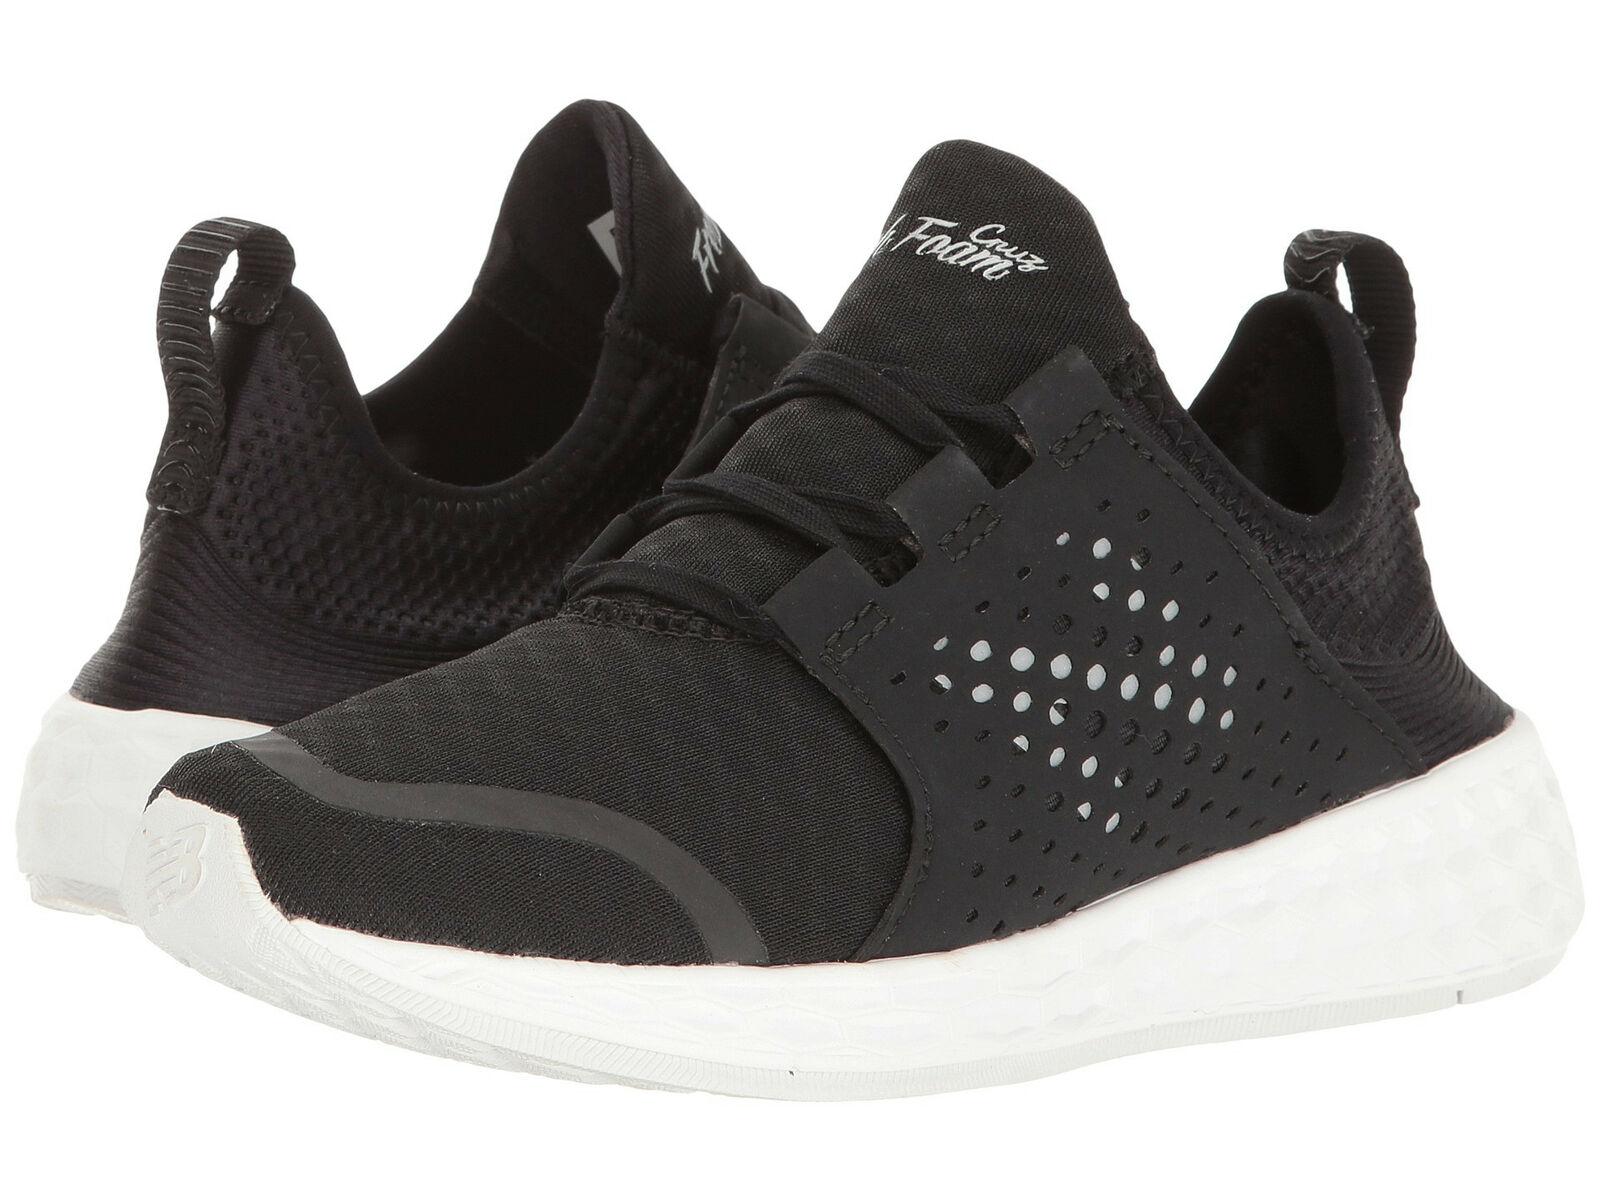 New Balance Fresh Foam Cruz Women's Sneaker shoes Black White WCRUZBK